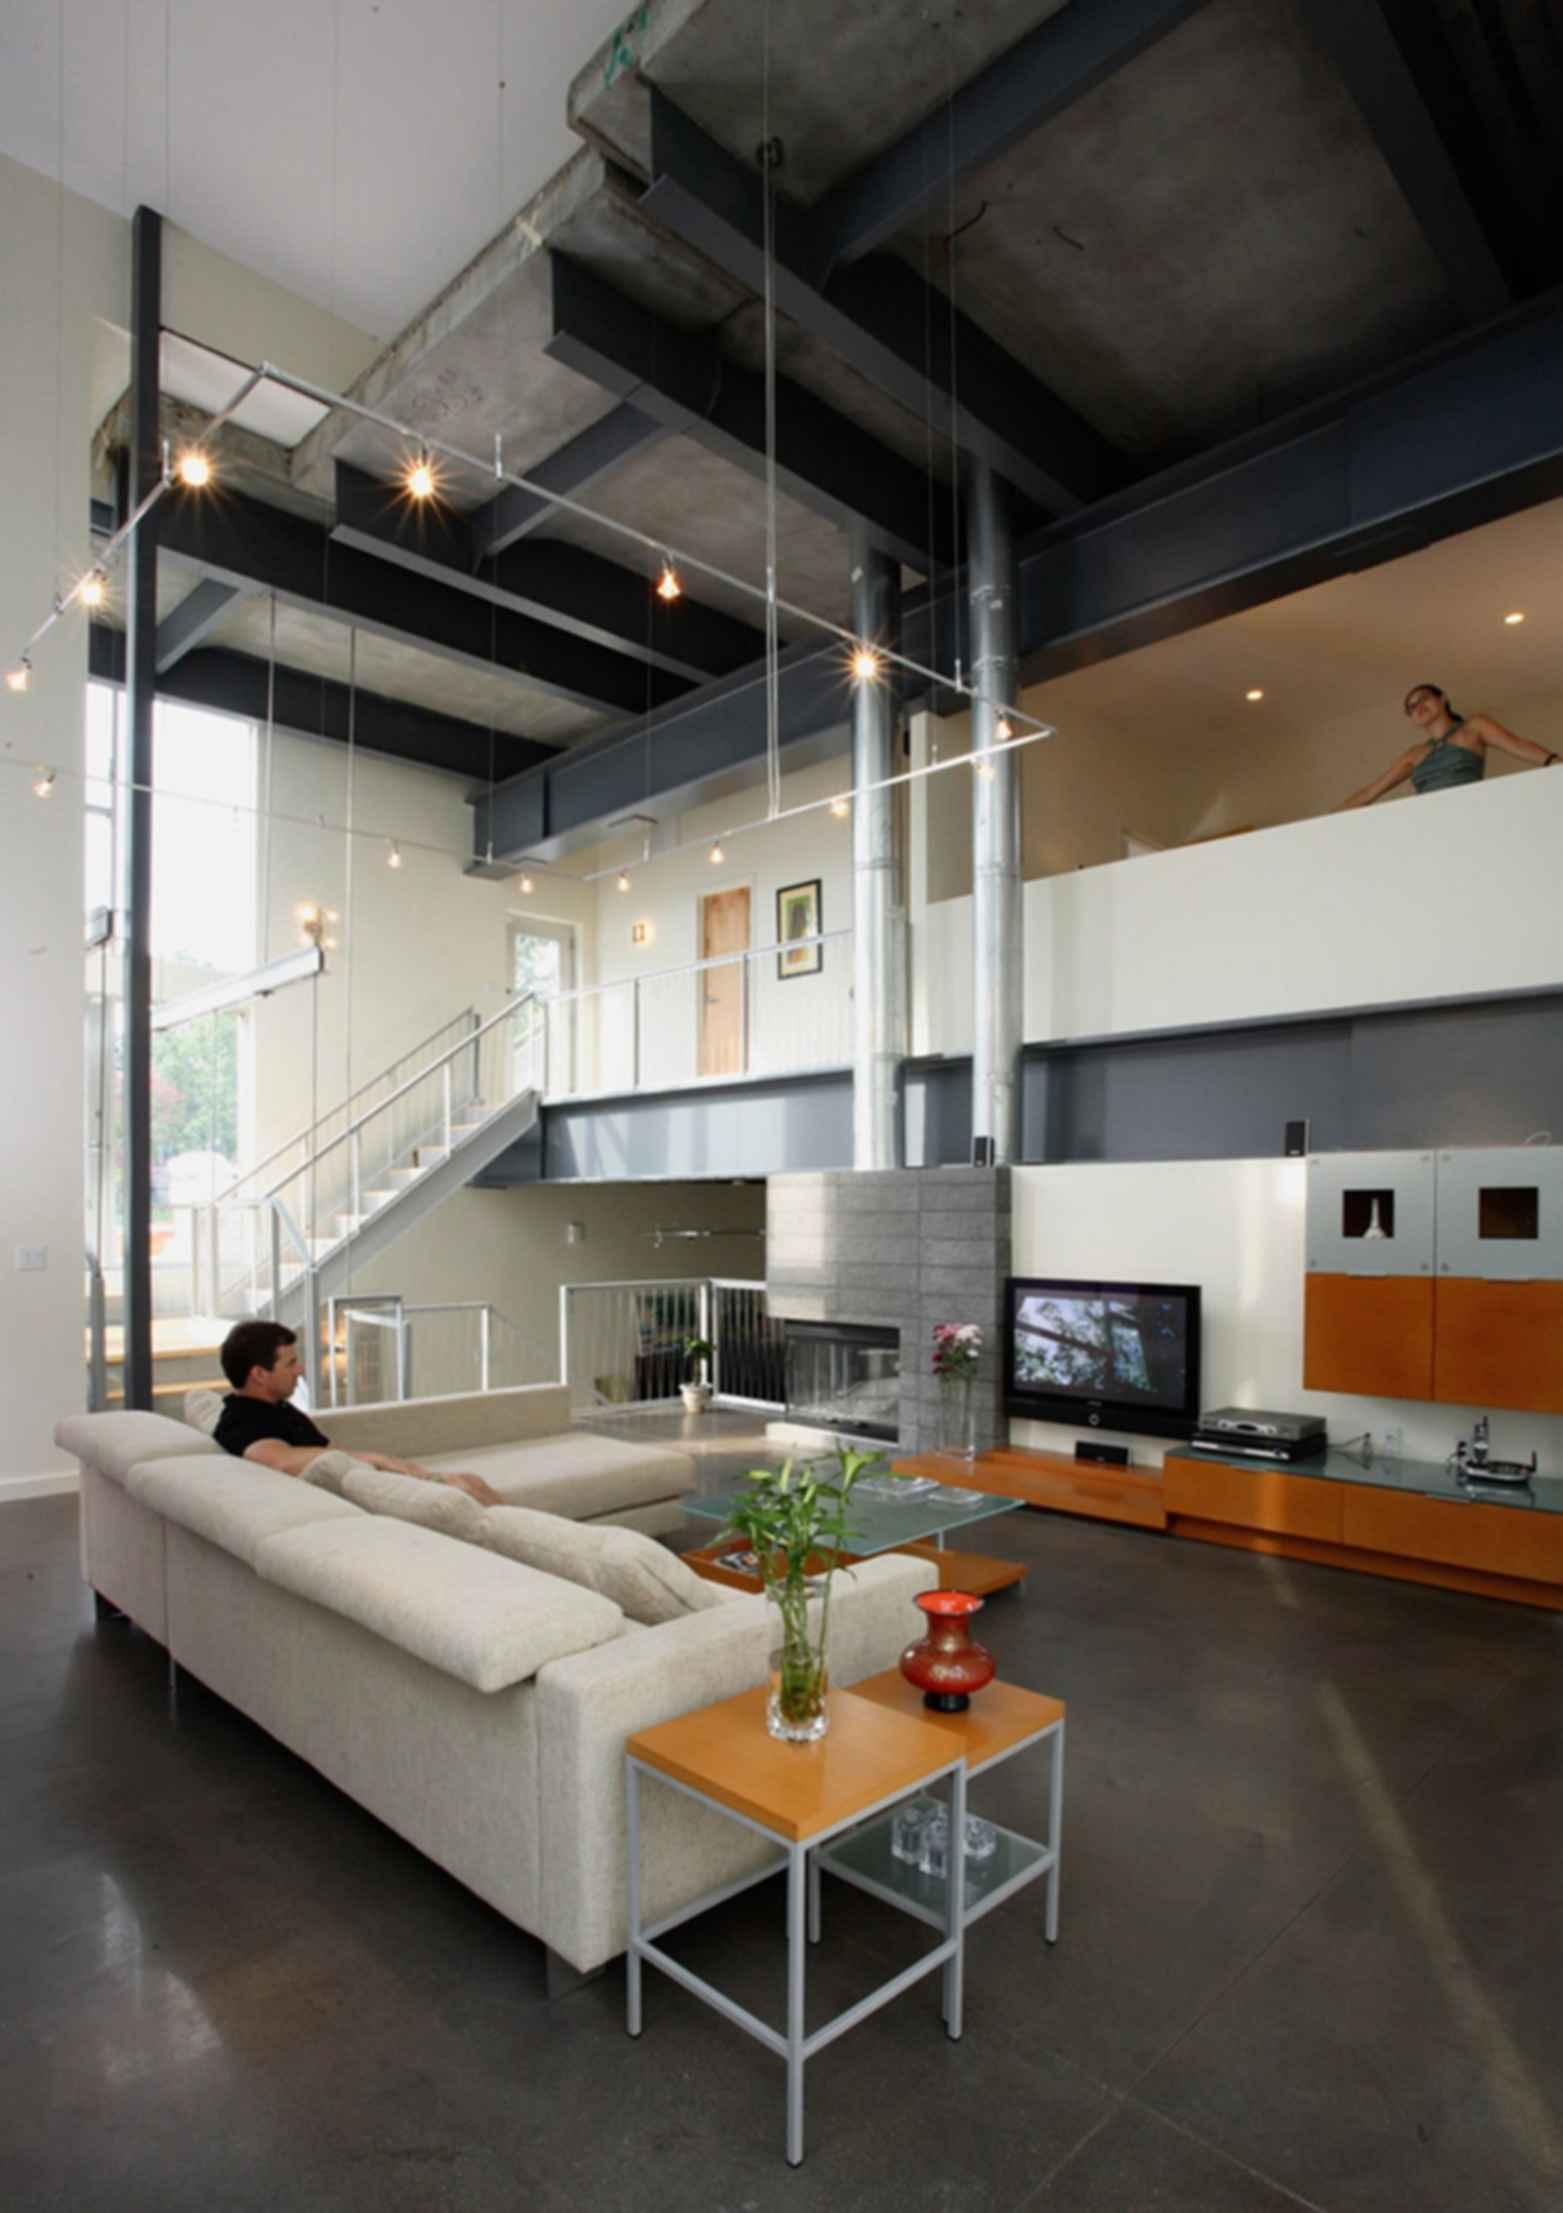 Big Dig House - Interior/Lounge